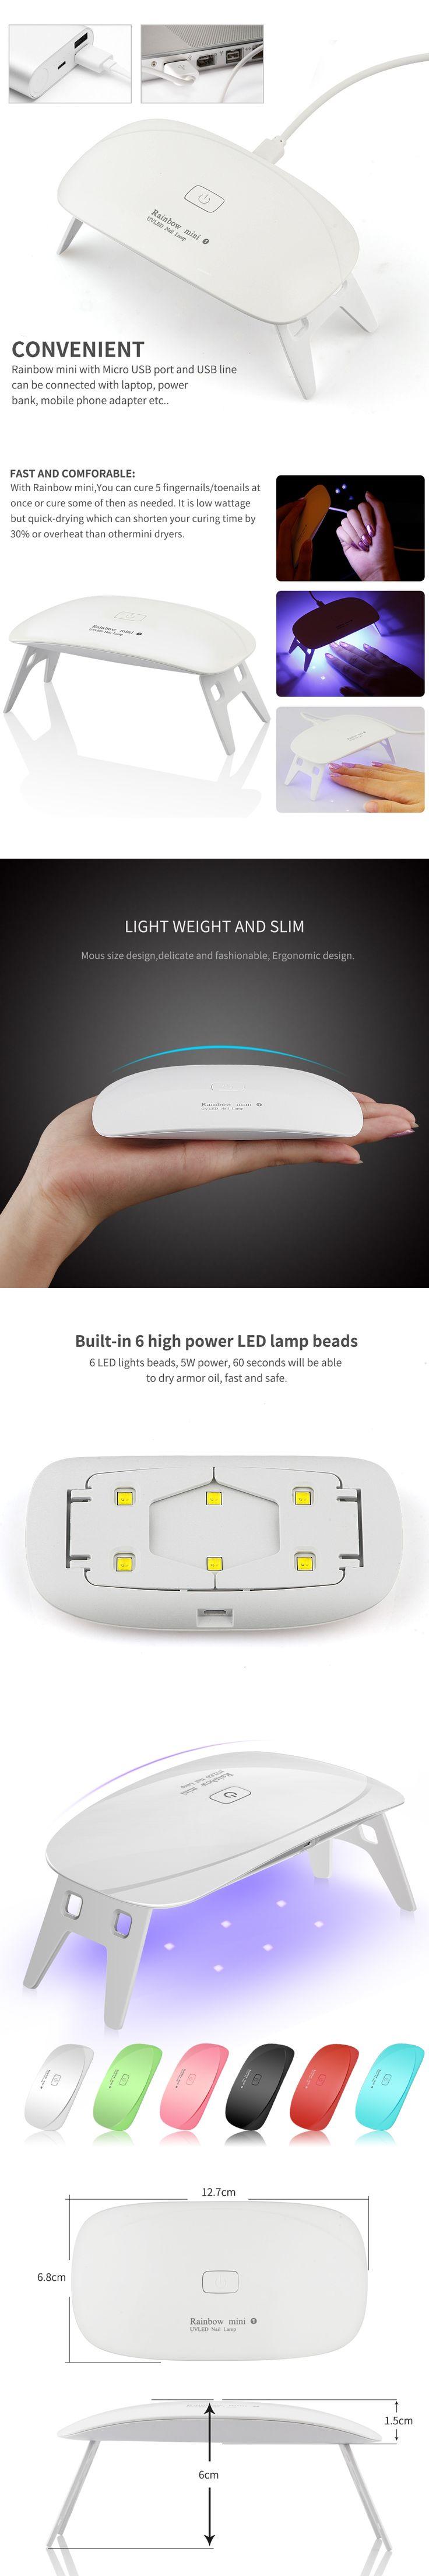 5W LED UV Nail Dryer Curing Lamp Light Portable for LED UV Gel Nail Polish USB Cable Nail Art Manicure Pedicure Home Use 6 Color